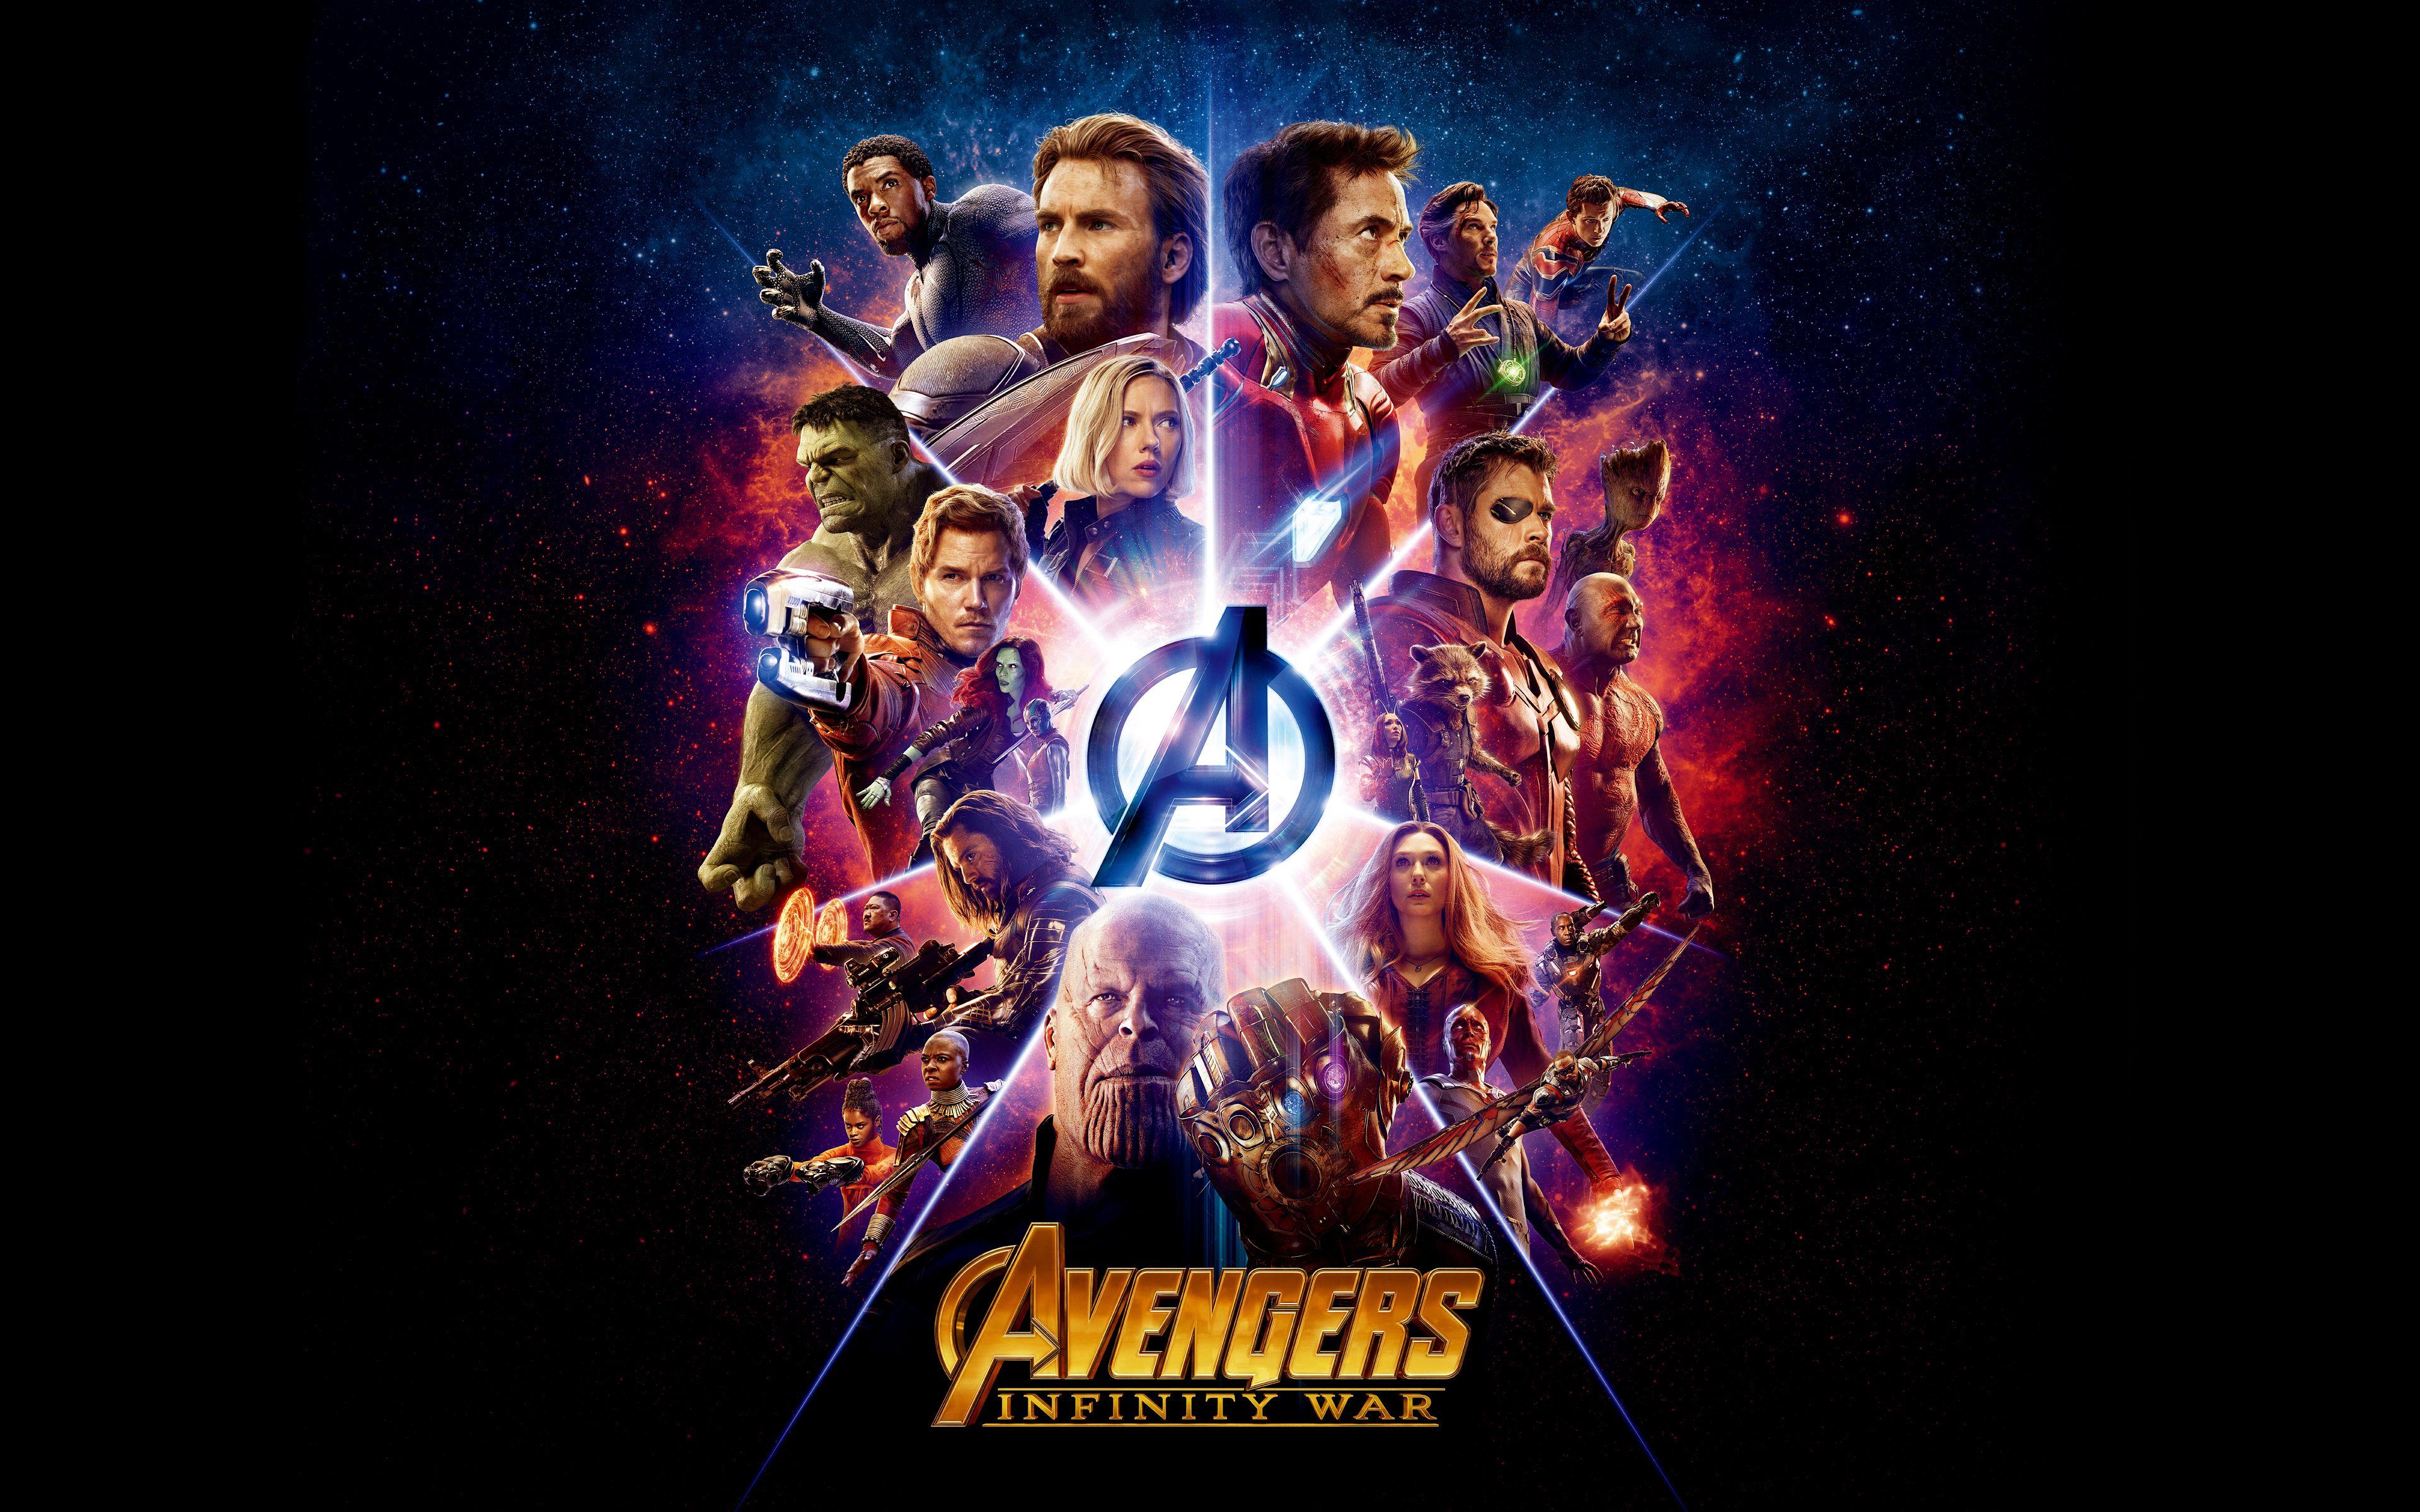 Wallpaper Infinity War